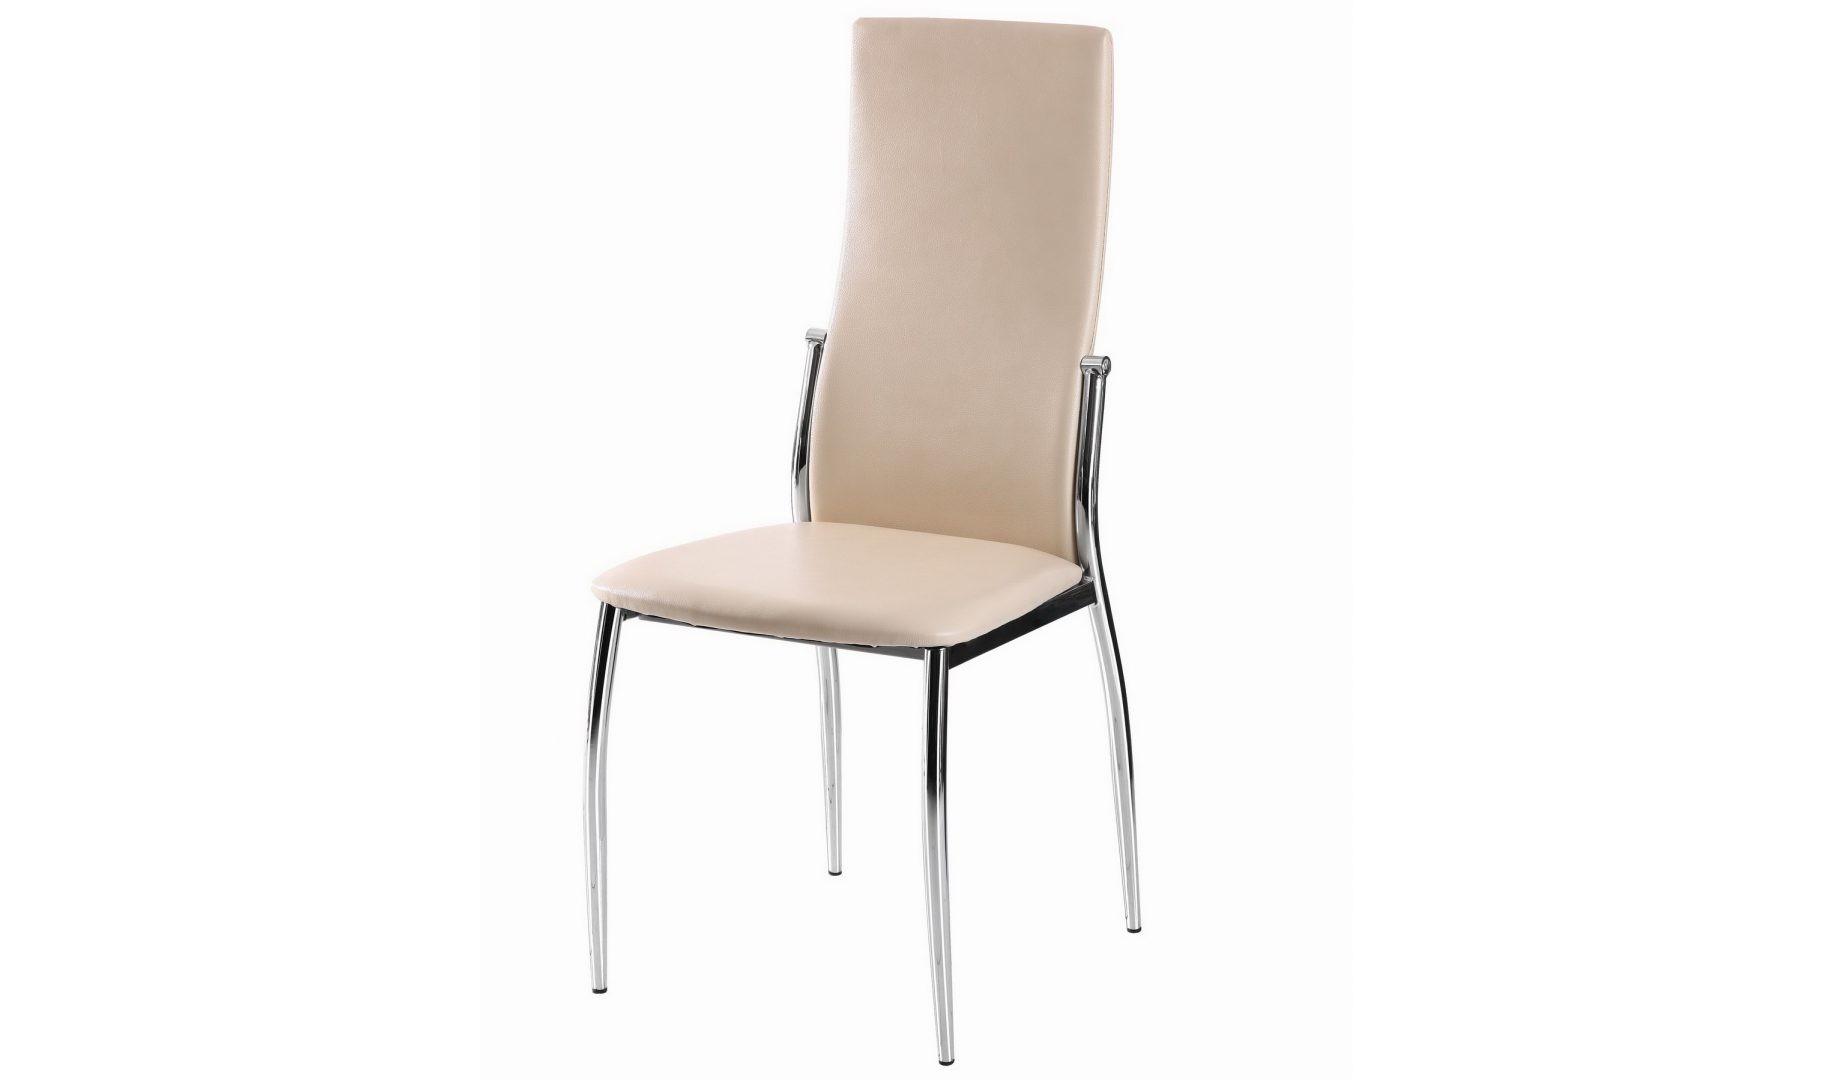 Стул 2368 (бежевый)Обеденные стулья<br><br><br>Material: Кожа<br>Width см: 45<br>Depth см: 51<br>Height см: 100